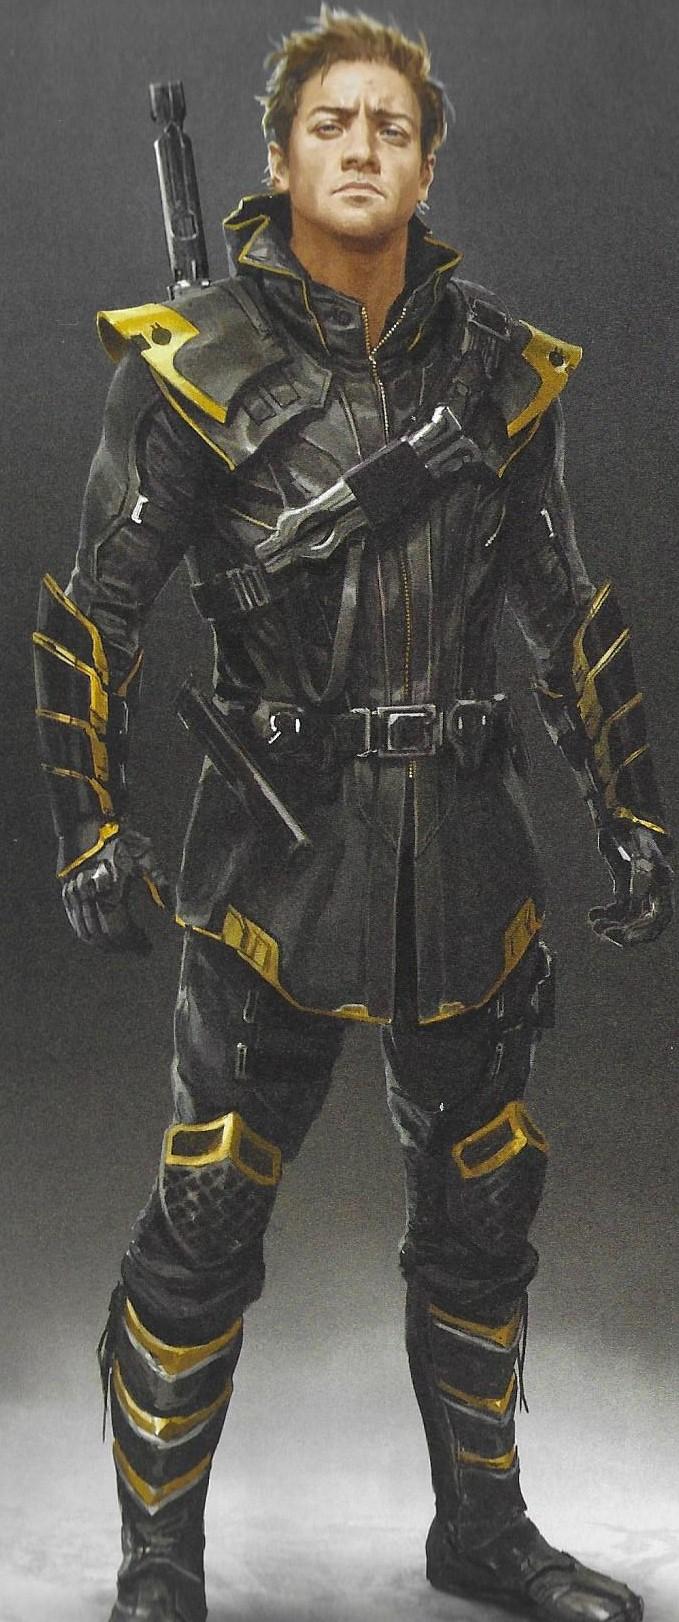 Avengers Endgame Concept Art Reveals Alternate Five Years Later Hawkeye Ronin And Black Widow Co Marvel Concept Art Marvel Characters Art Superhero Design